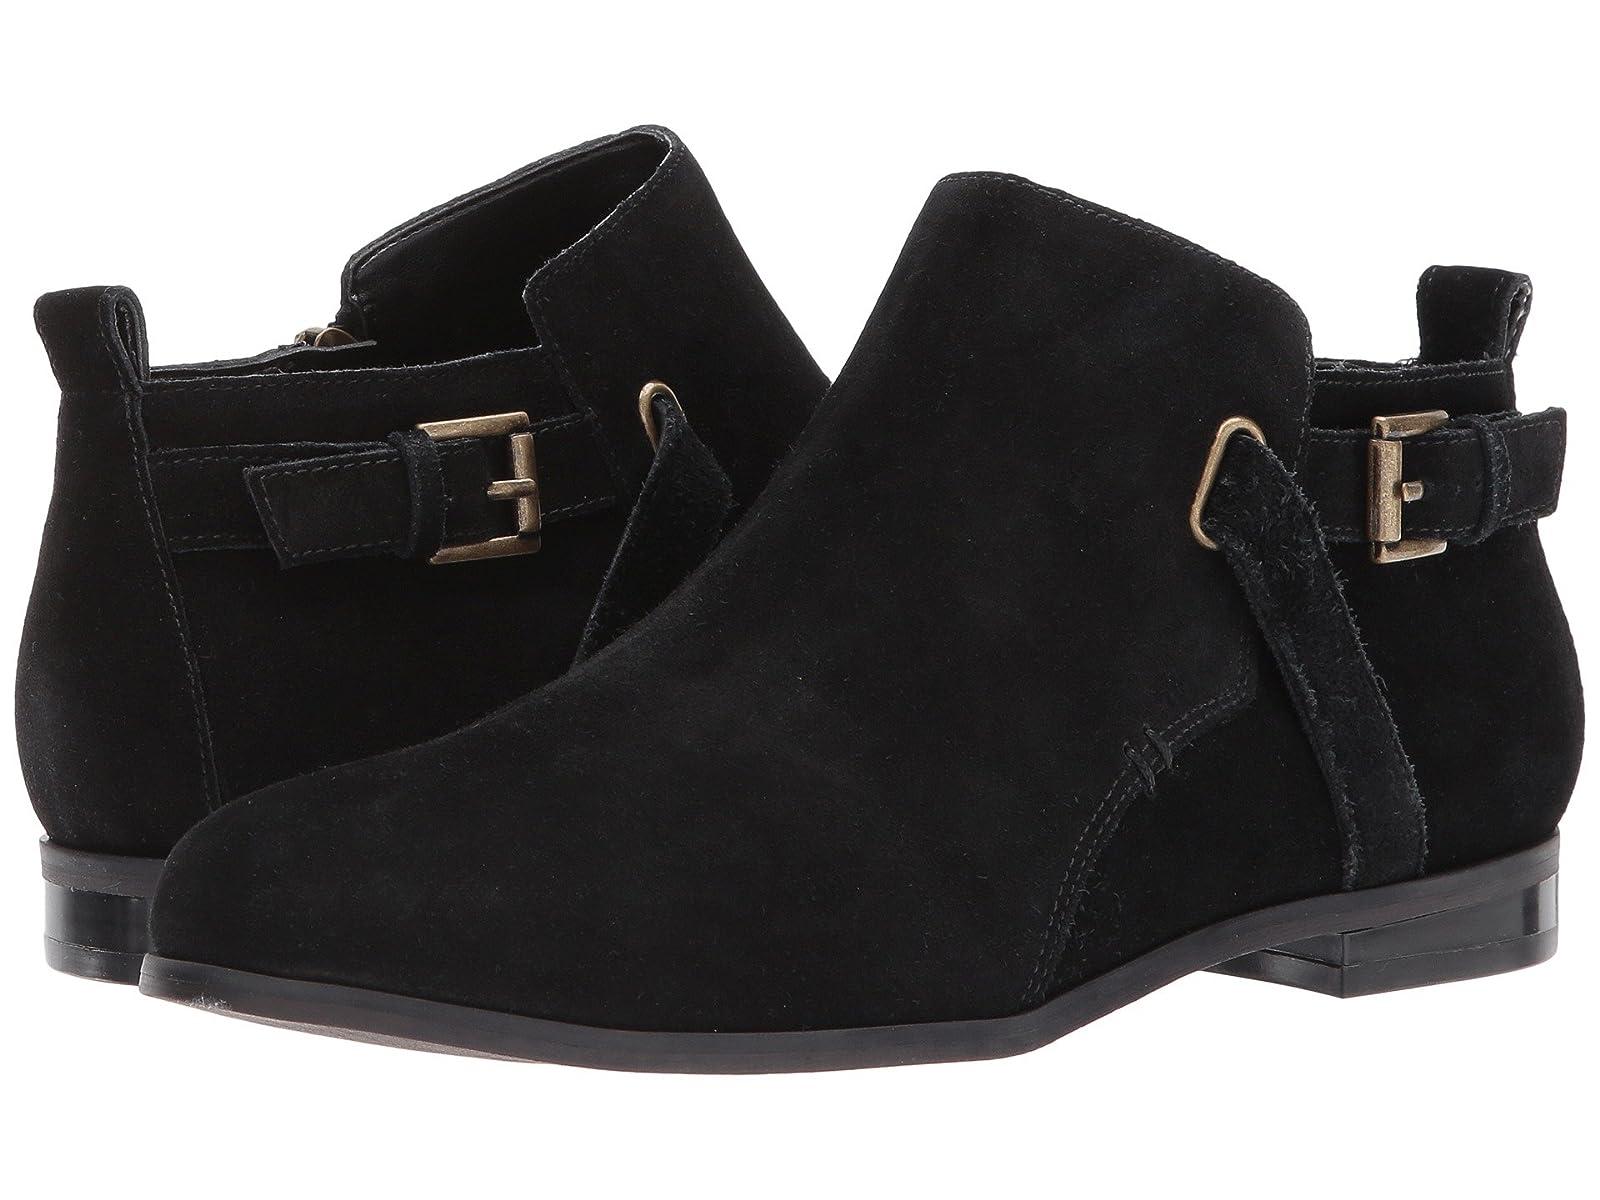 Nine West EdoinCheap and distinctive eye-catching shoes